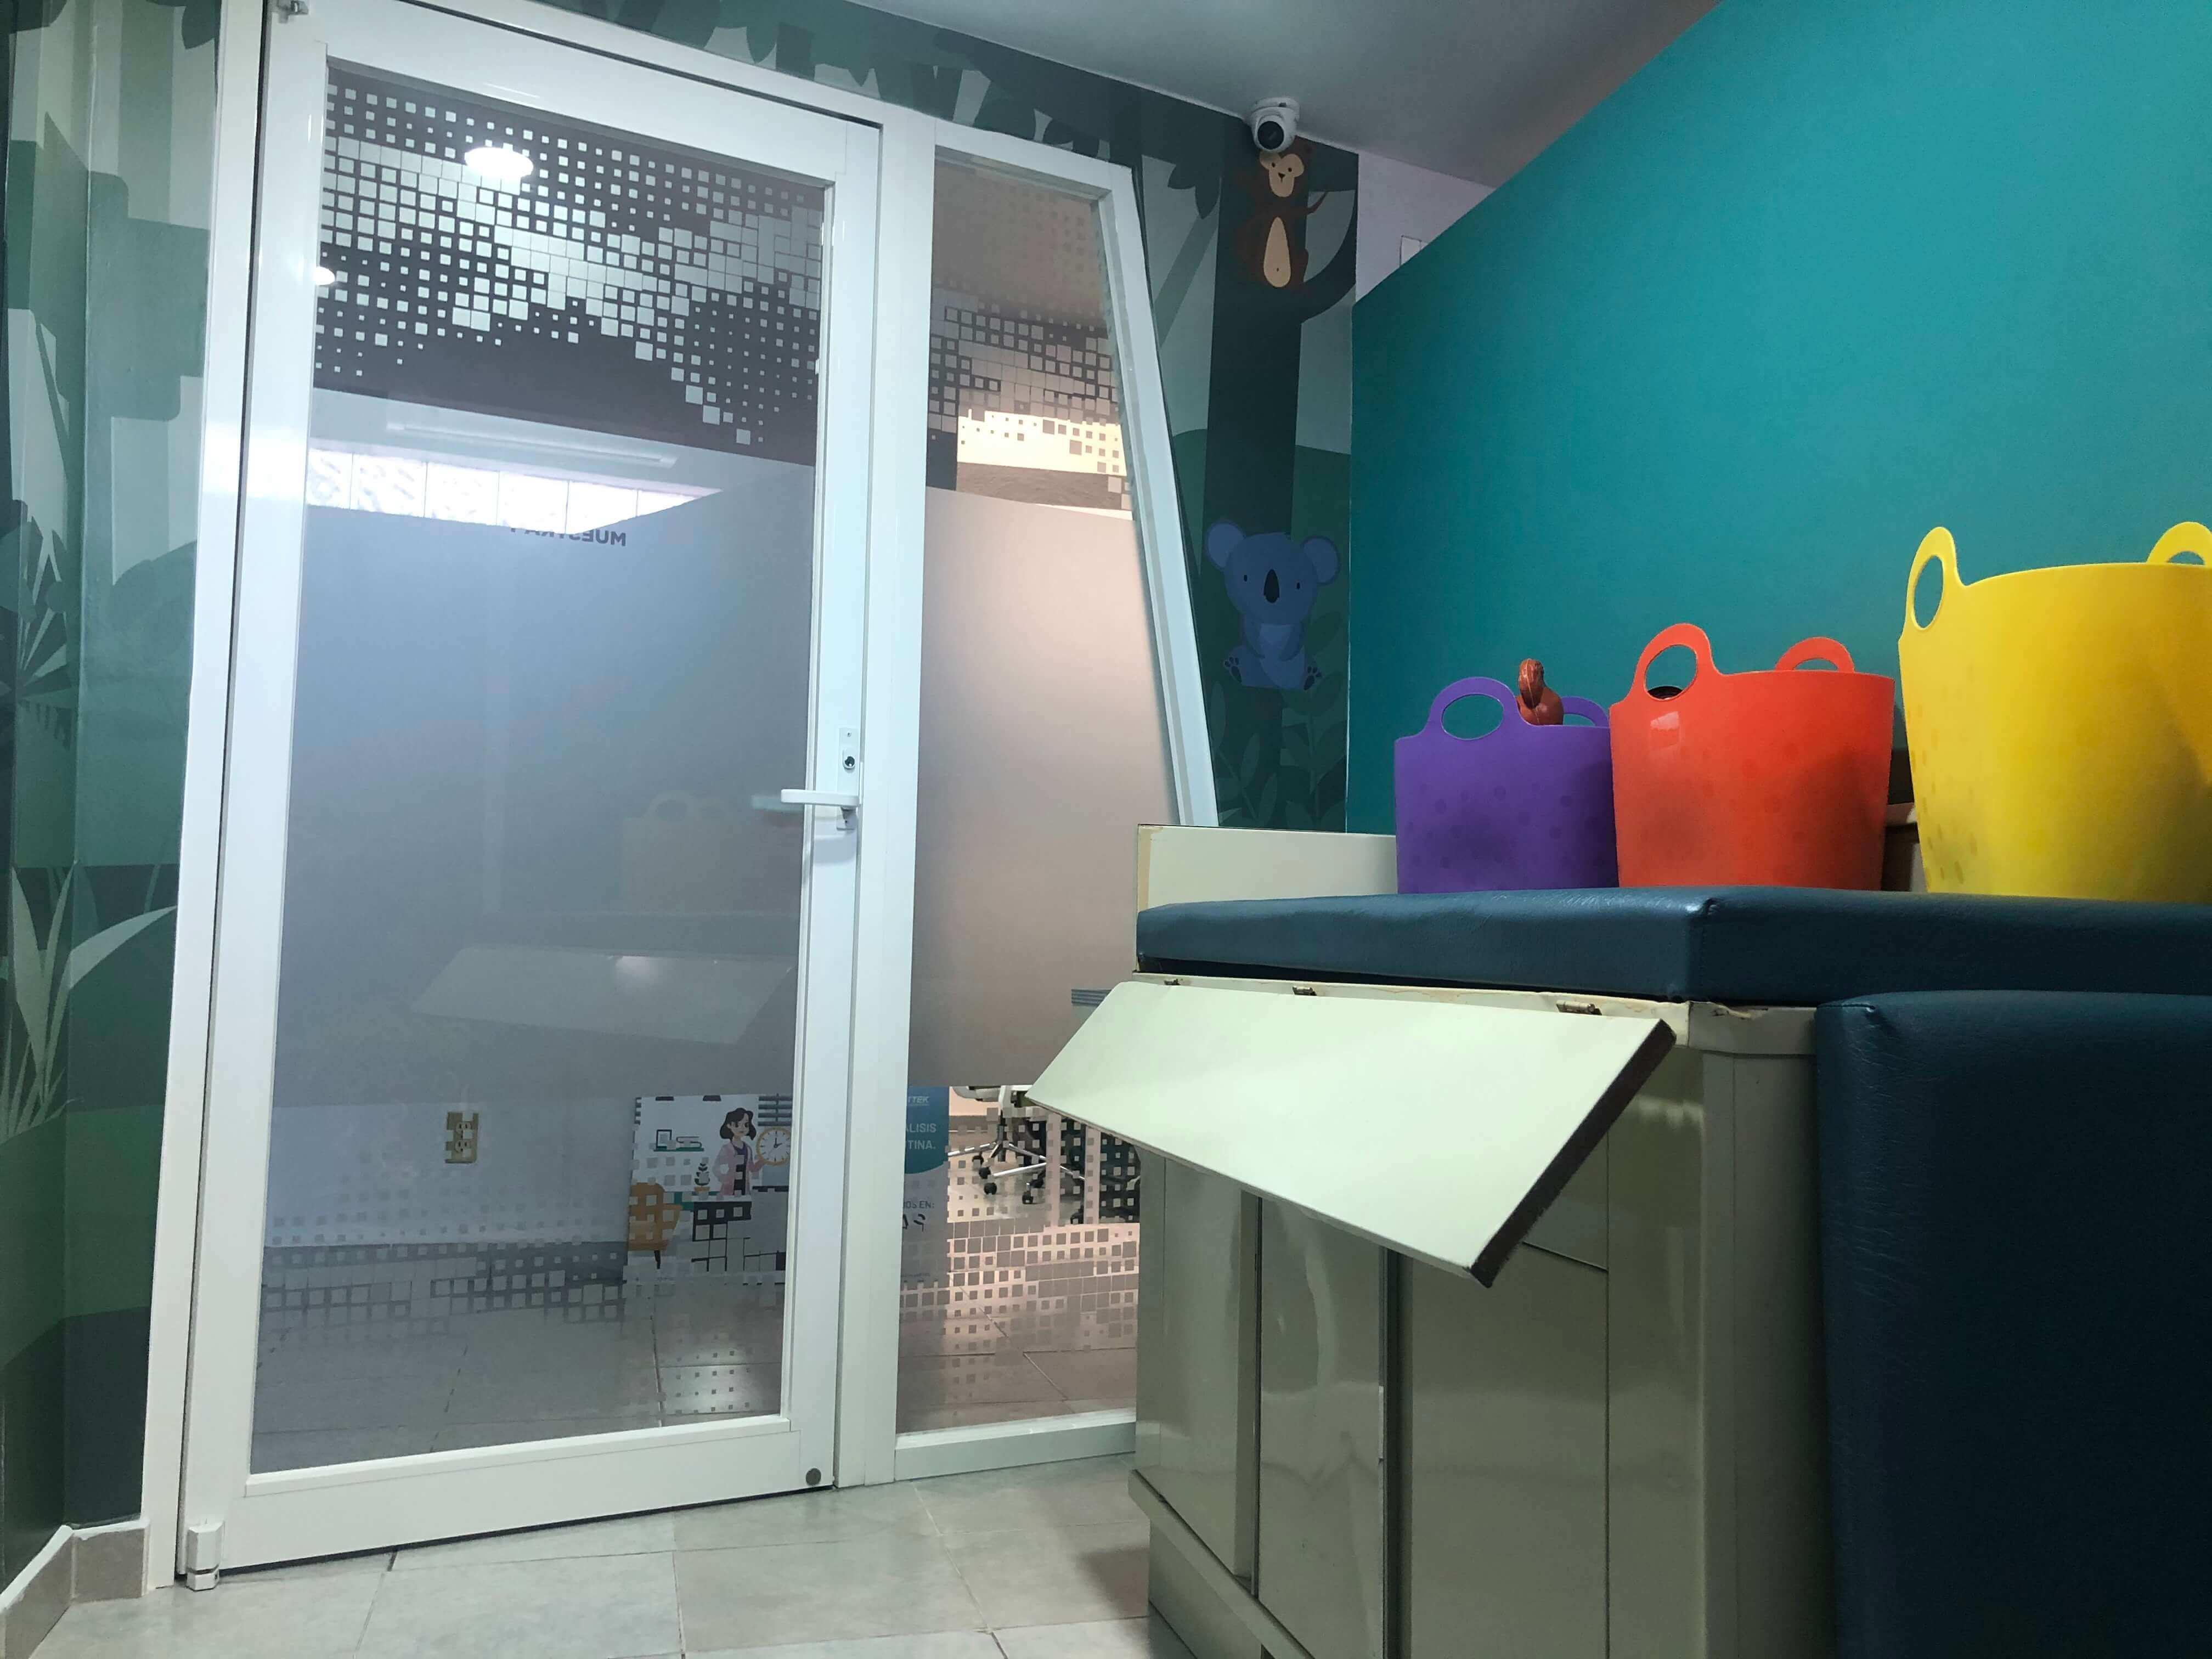 Laboratorio-biottek-area-pediatrica-alameda-cordoba-3.jpg